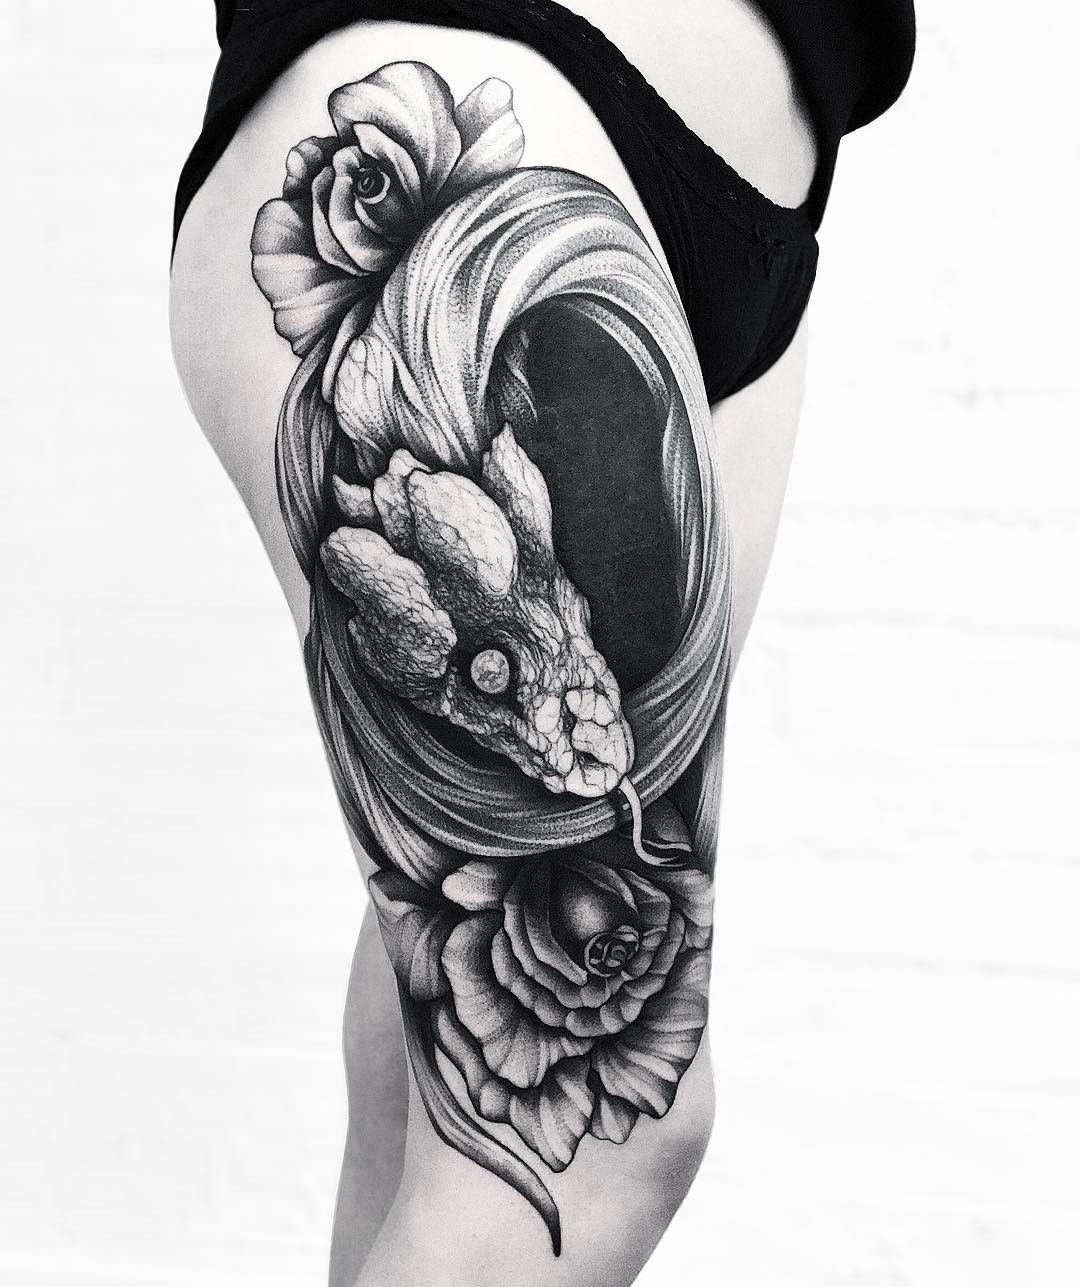 Meaning Of Snake Tattoos: Best Snake Tattoos Designs Ideas // September, 2019